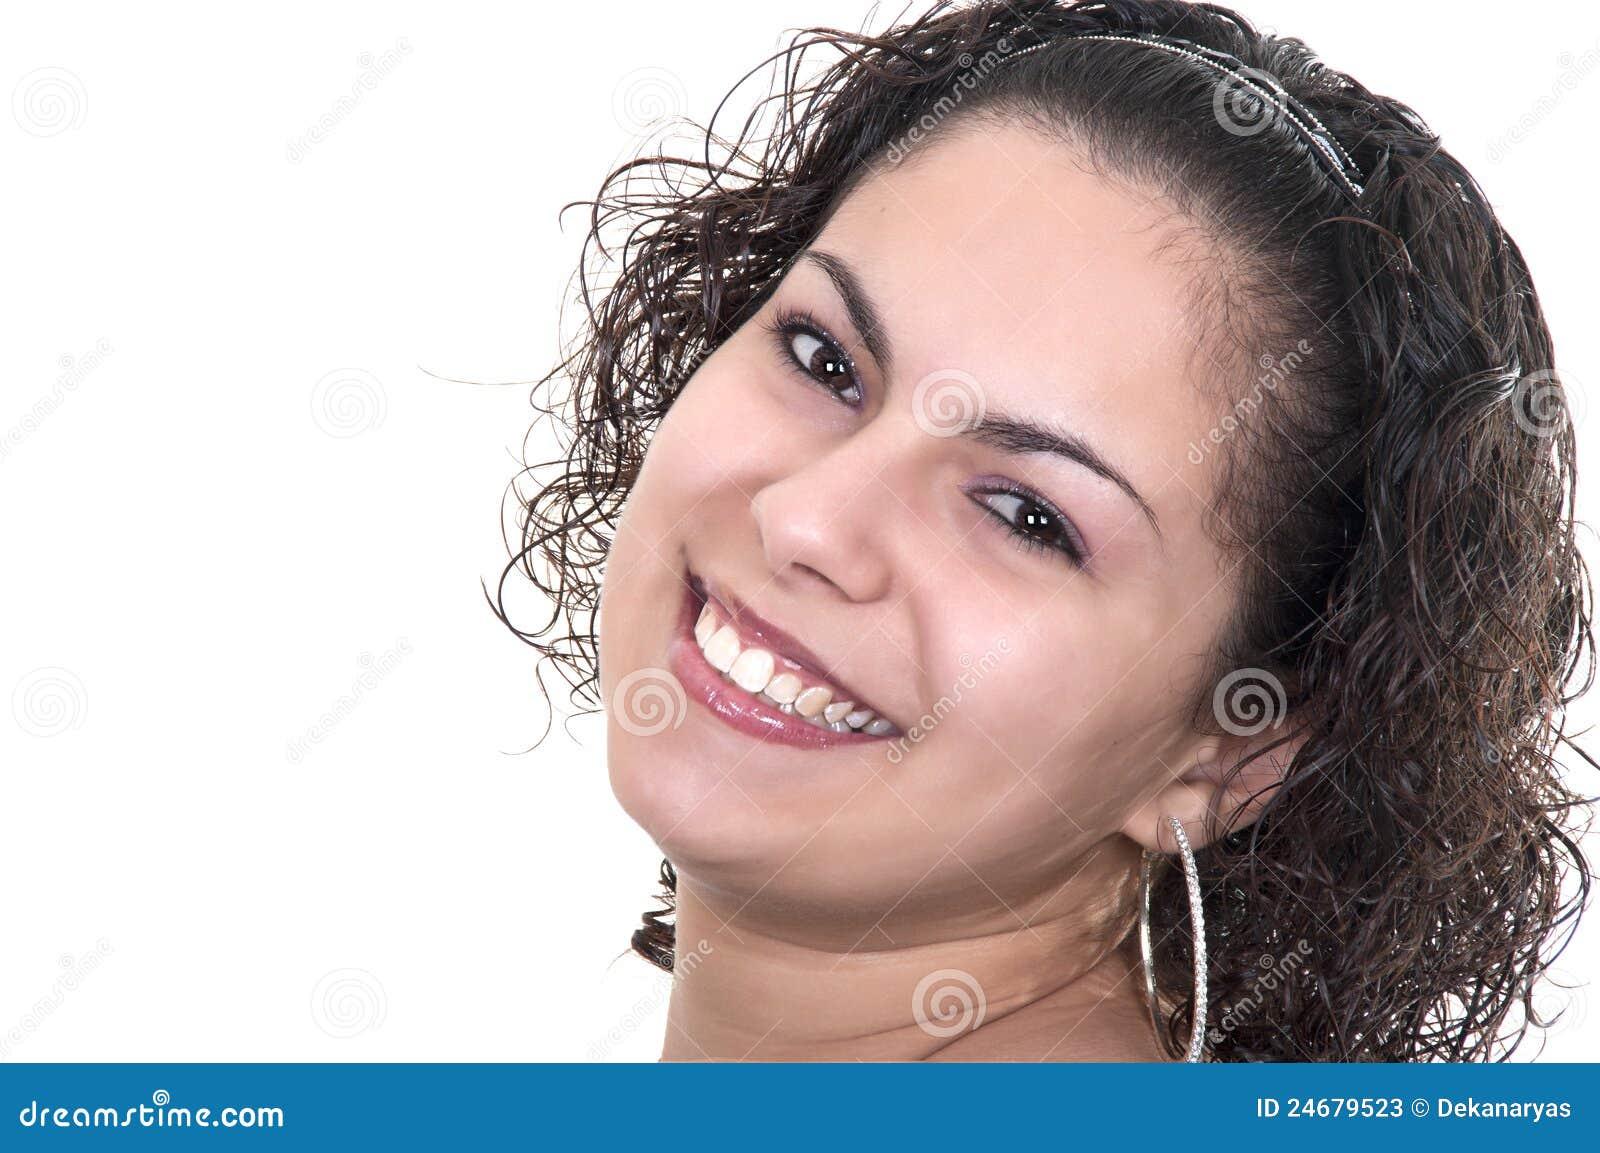 hairy latin woman: